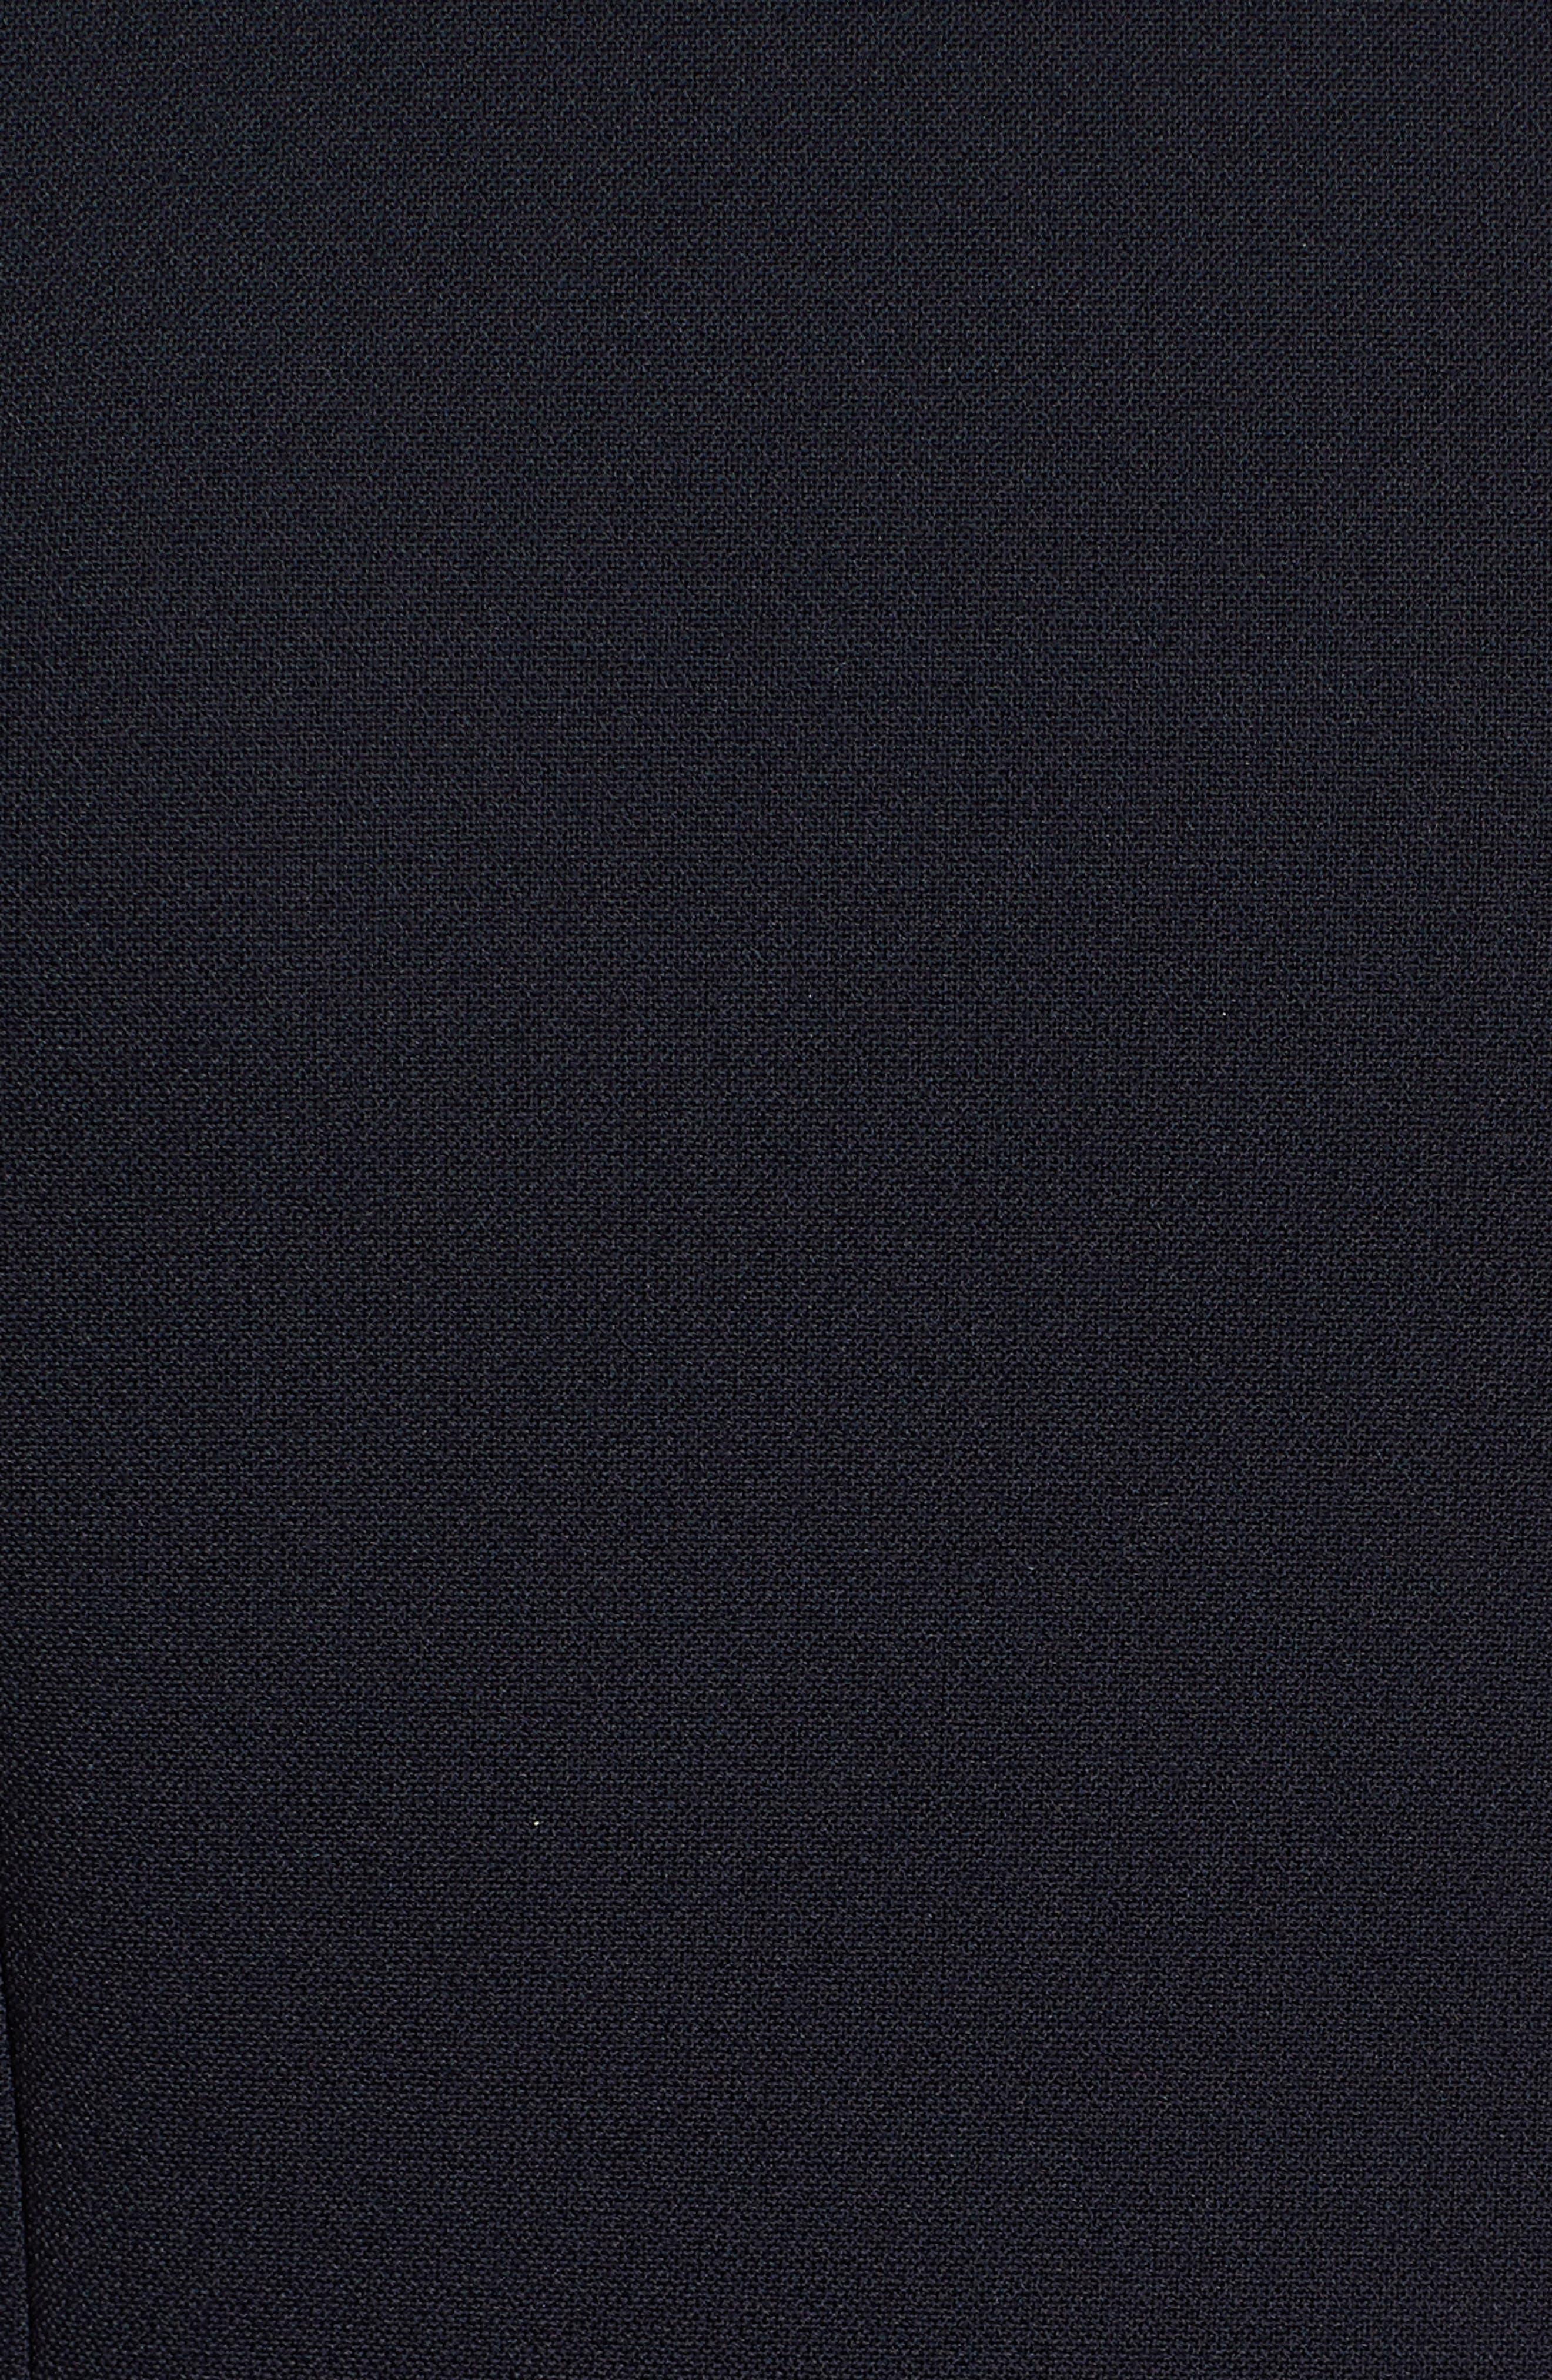 Idama Top,                             Alternate thumbnail 5, color,                             Black